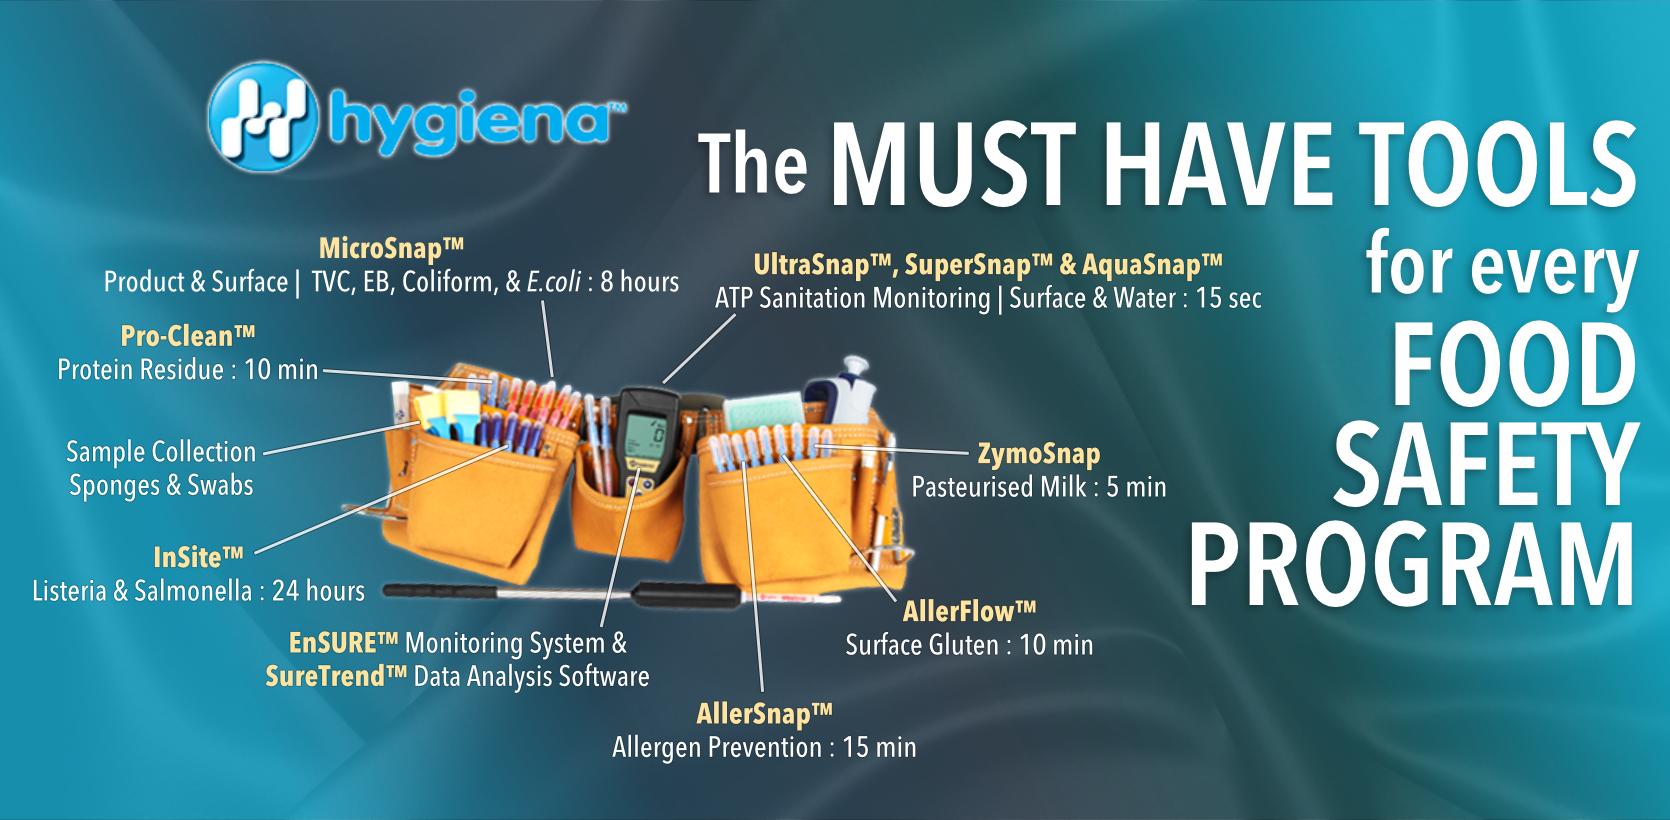 Hygiena, Testo, Anton Paar, Comark, Atago, Cooper-Atkins, A&D Weighing, tempmate, DeltaTrak, Morinaga, Rheintacho, Interscience, Micro Essential, Climet, Nissui Pharmaceutical